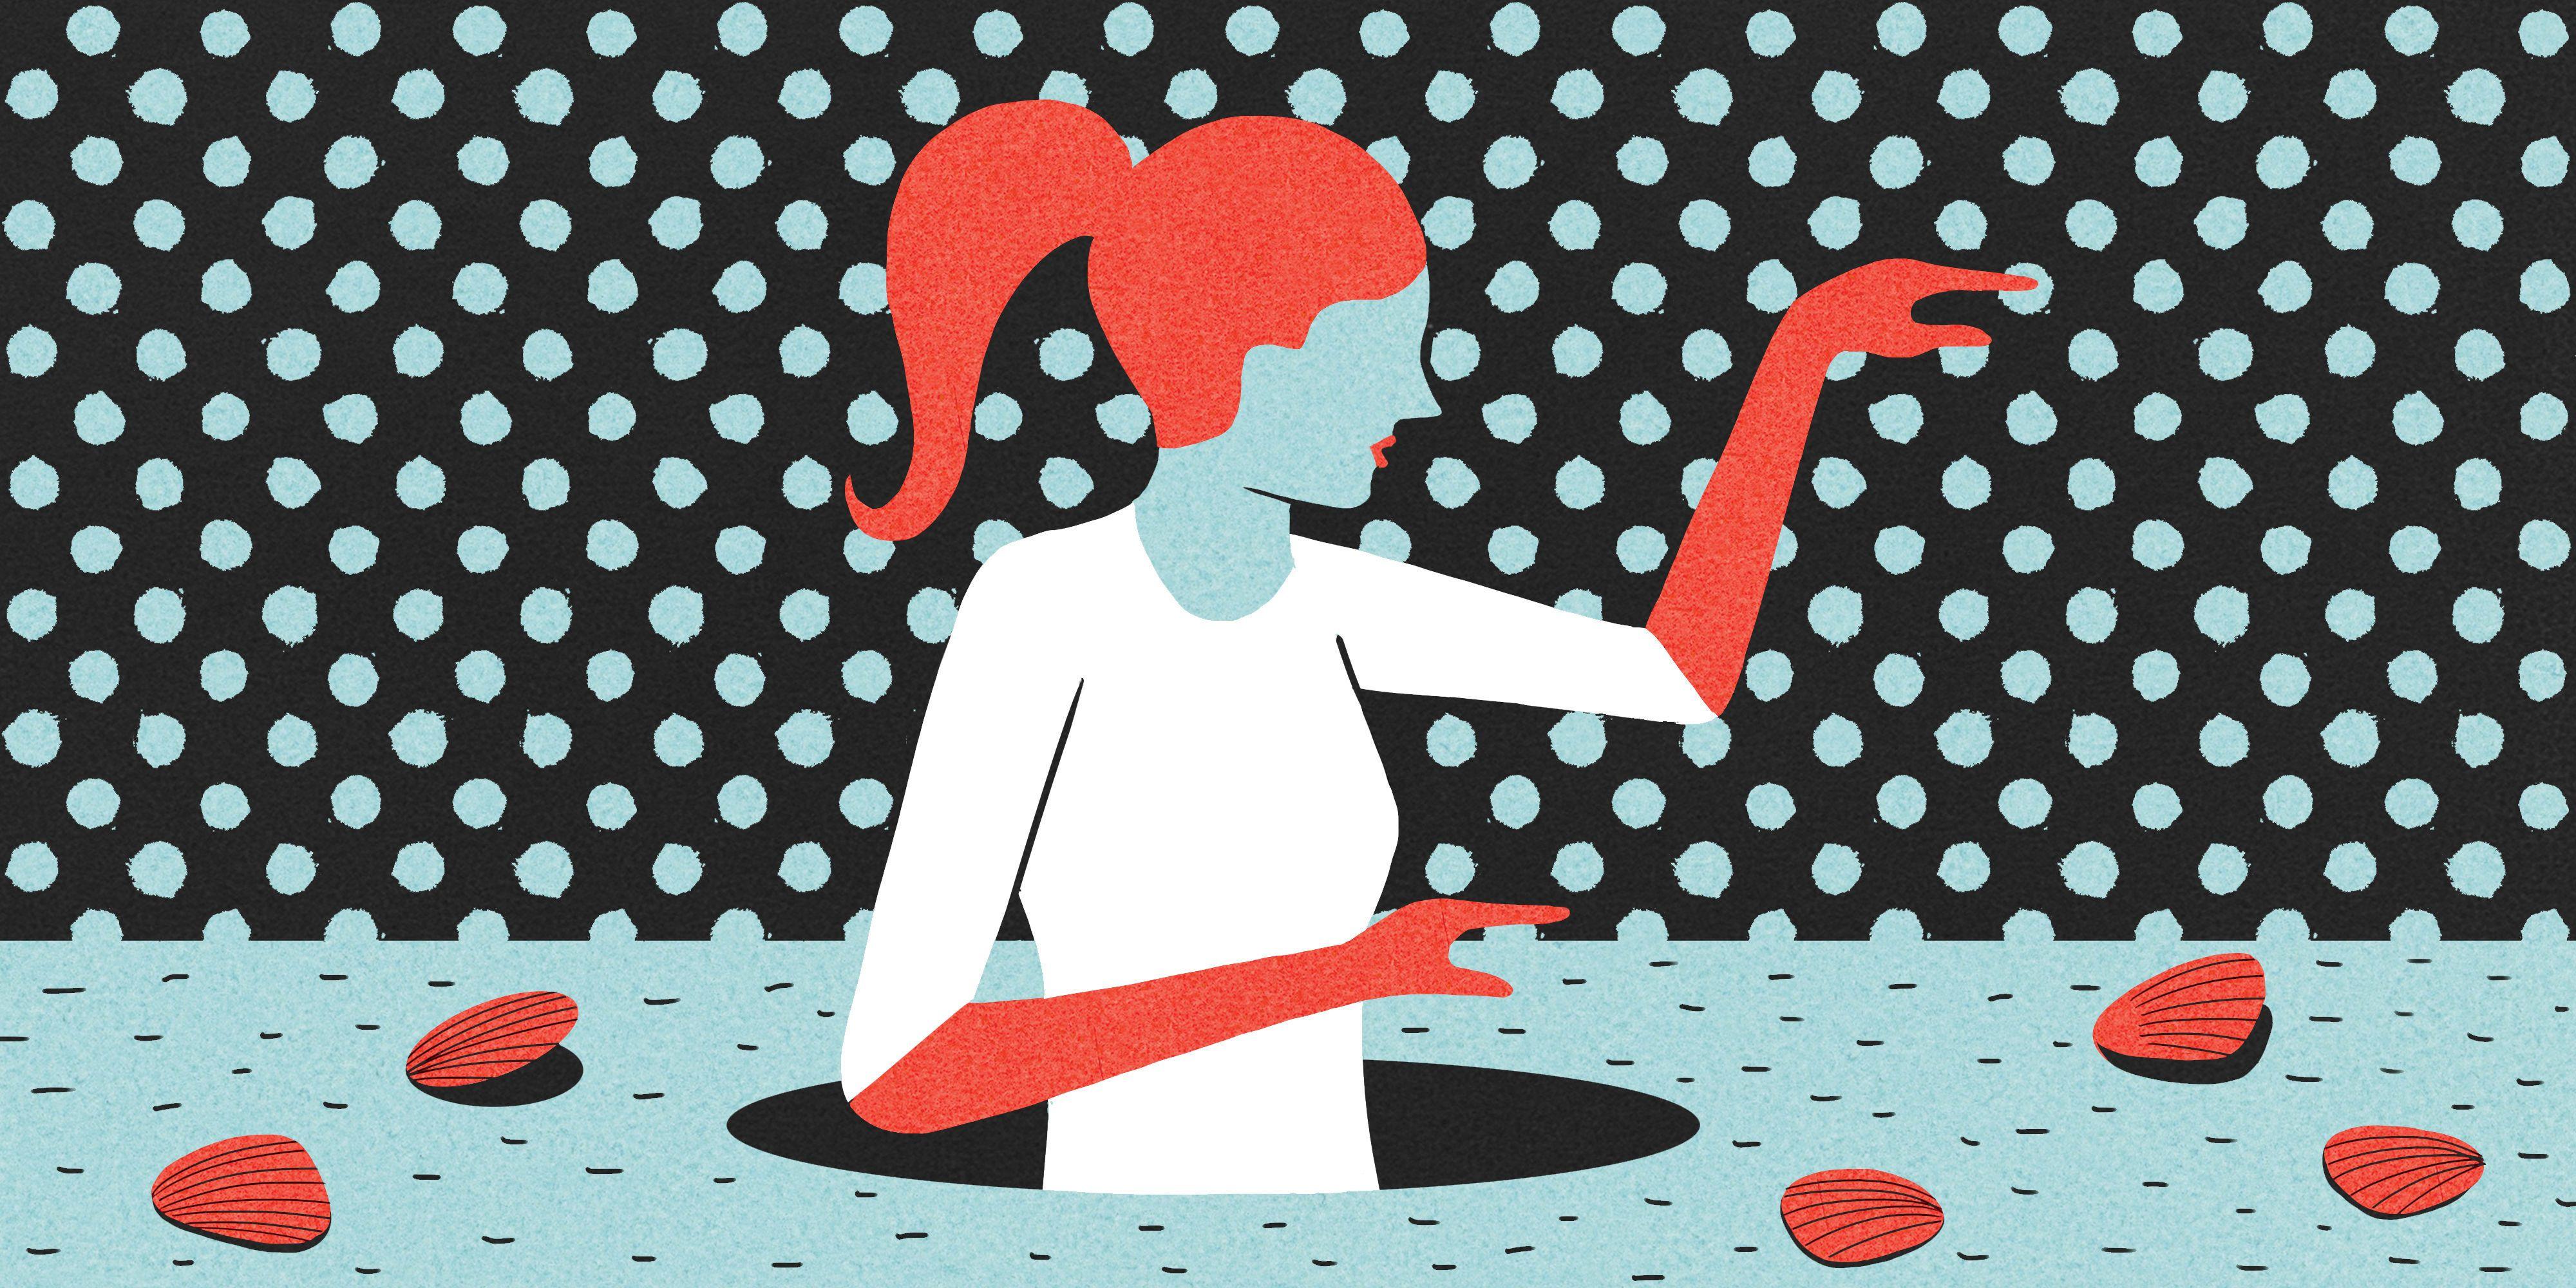 daily love horoscope aries elle